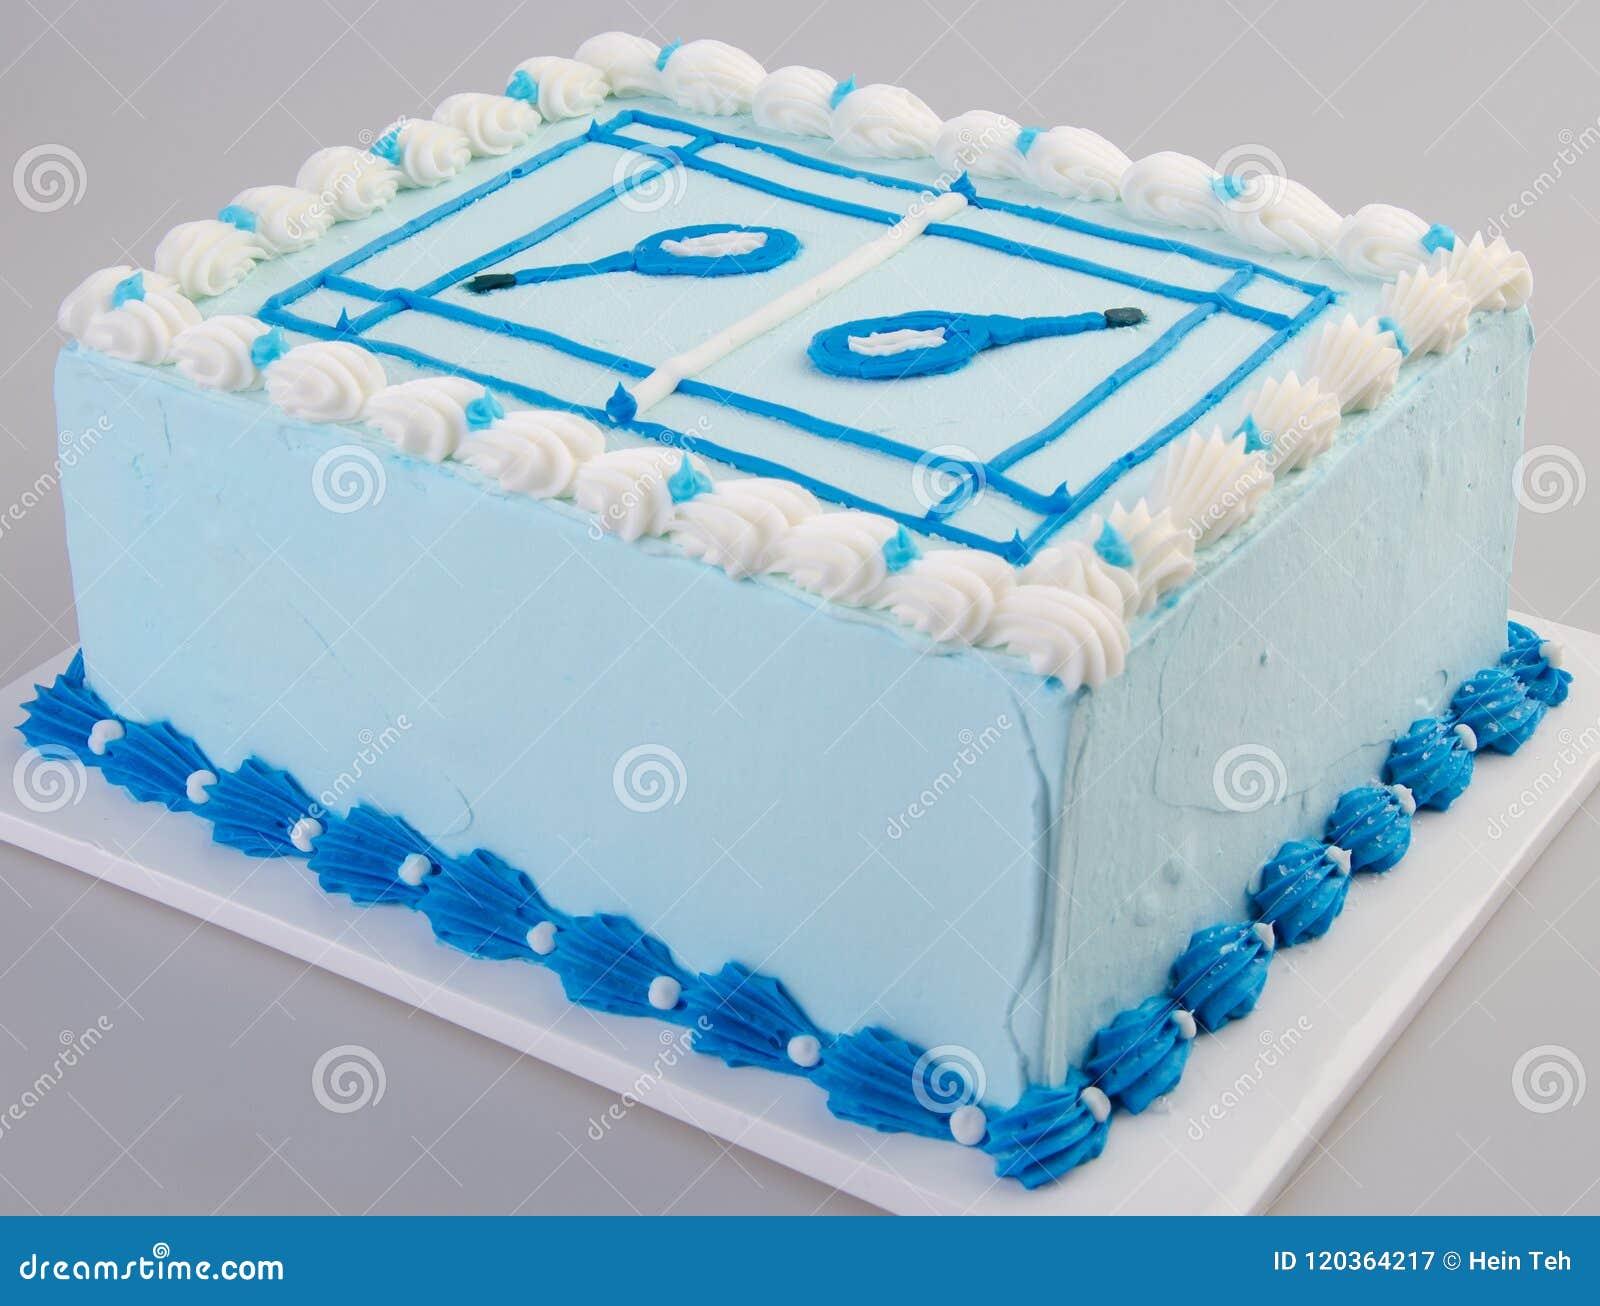 Cake Ice Cream On Background